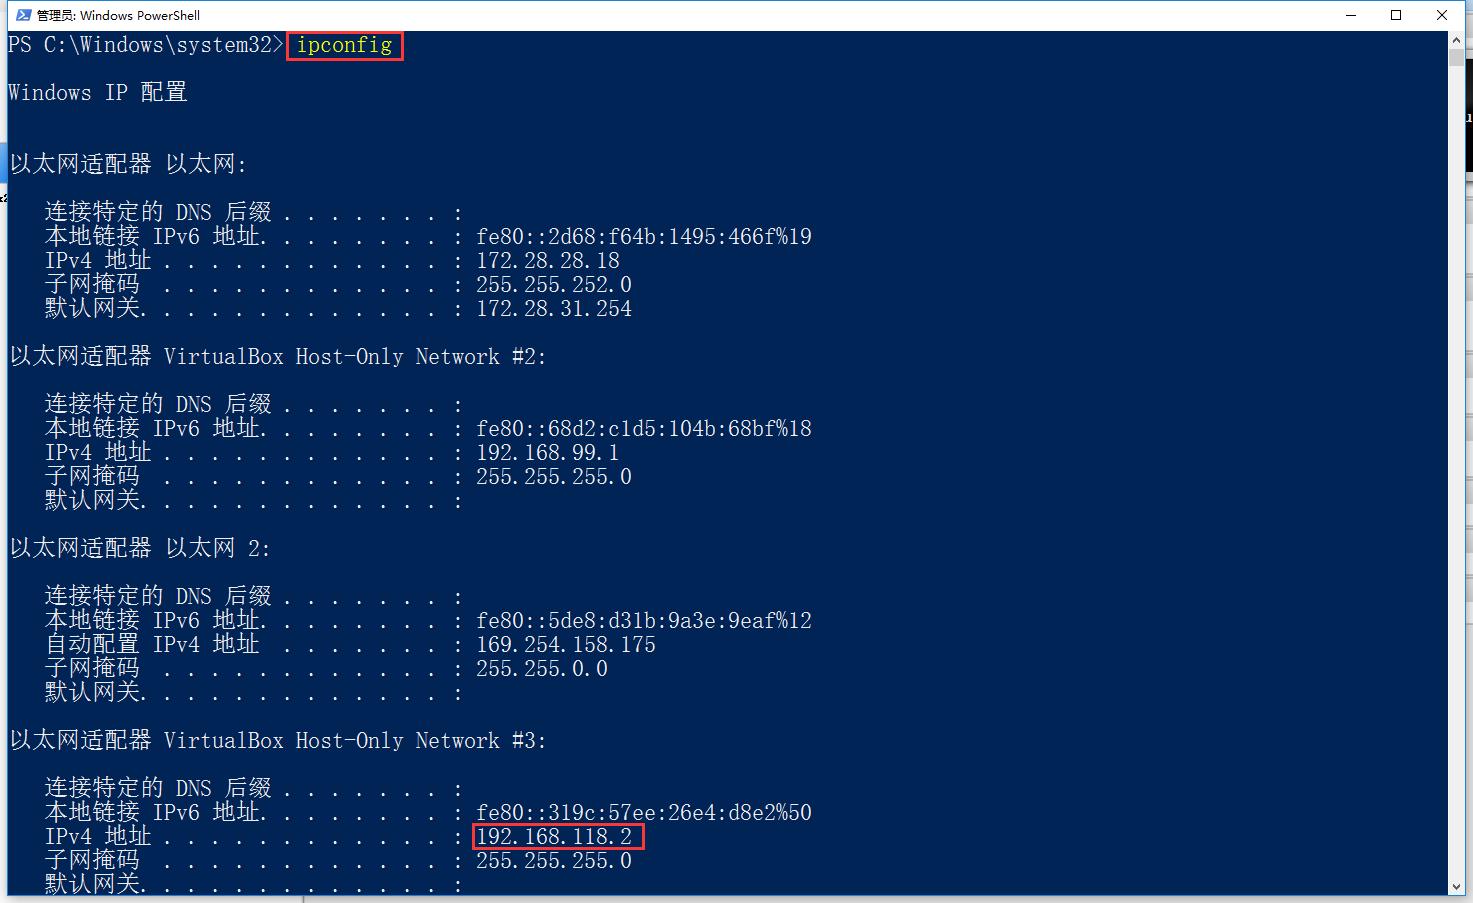 打开 Windows PowerShell,执行命令:ipconfig,查看最后一个 VirtualBox Host-Only Network #3